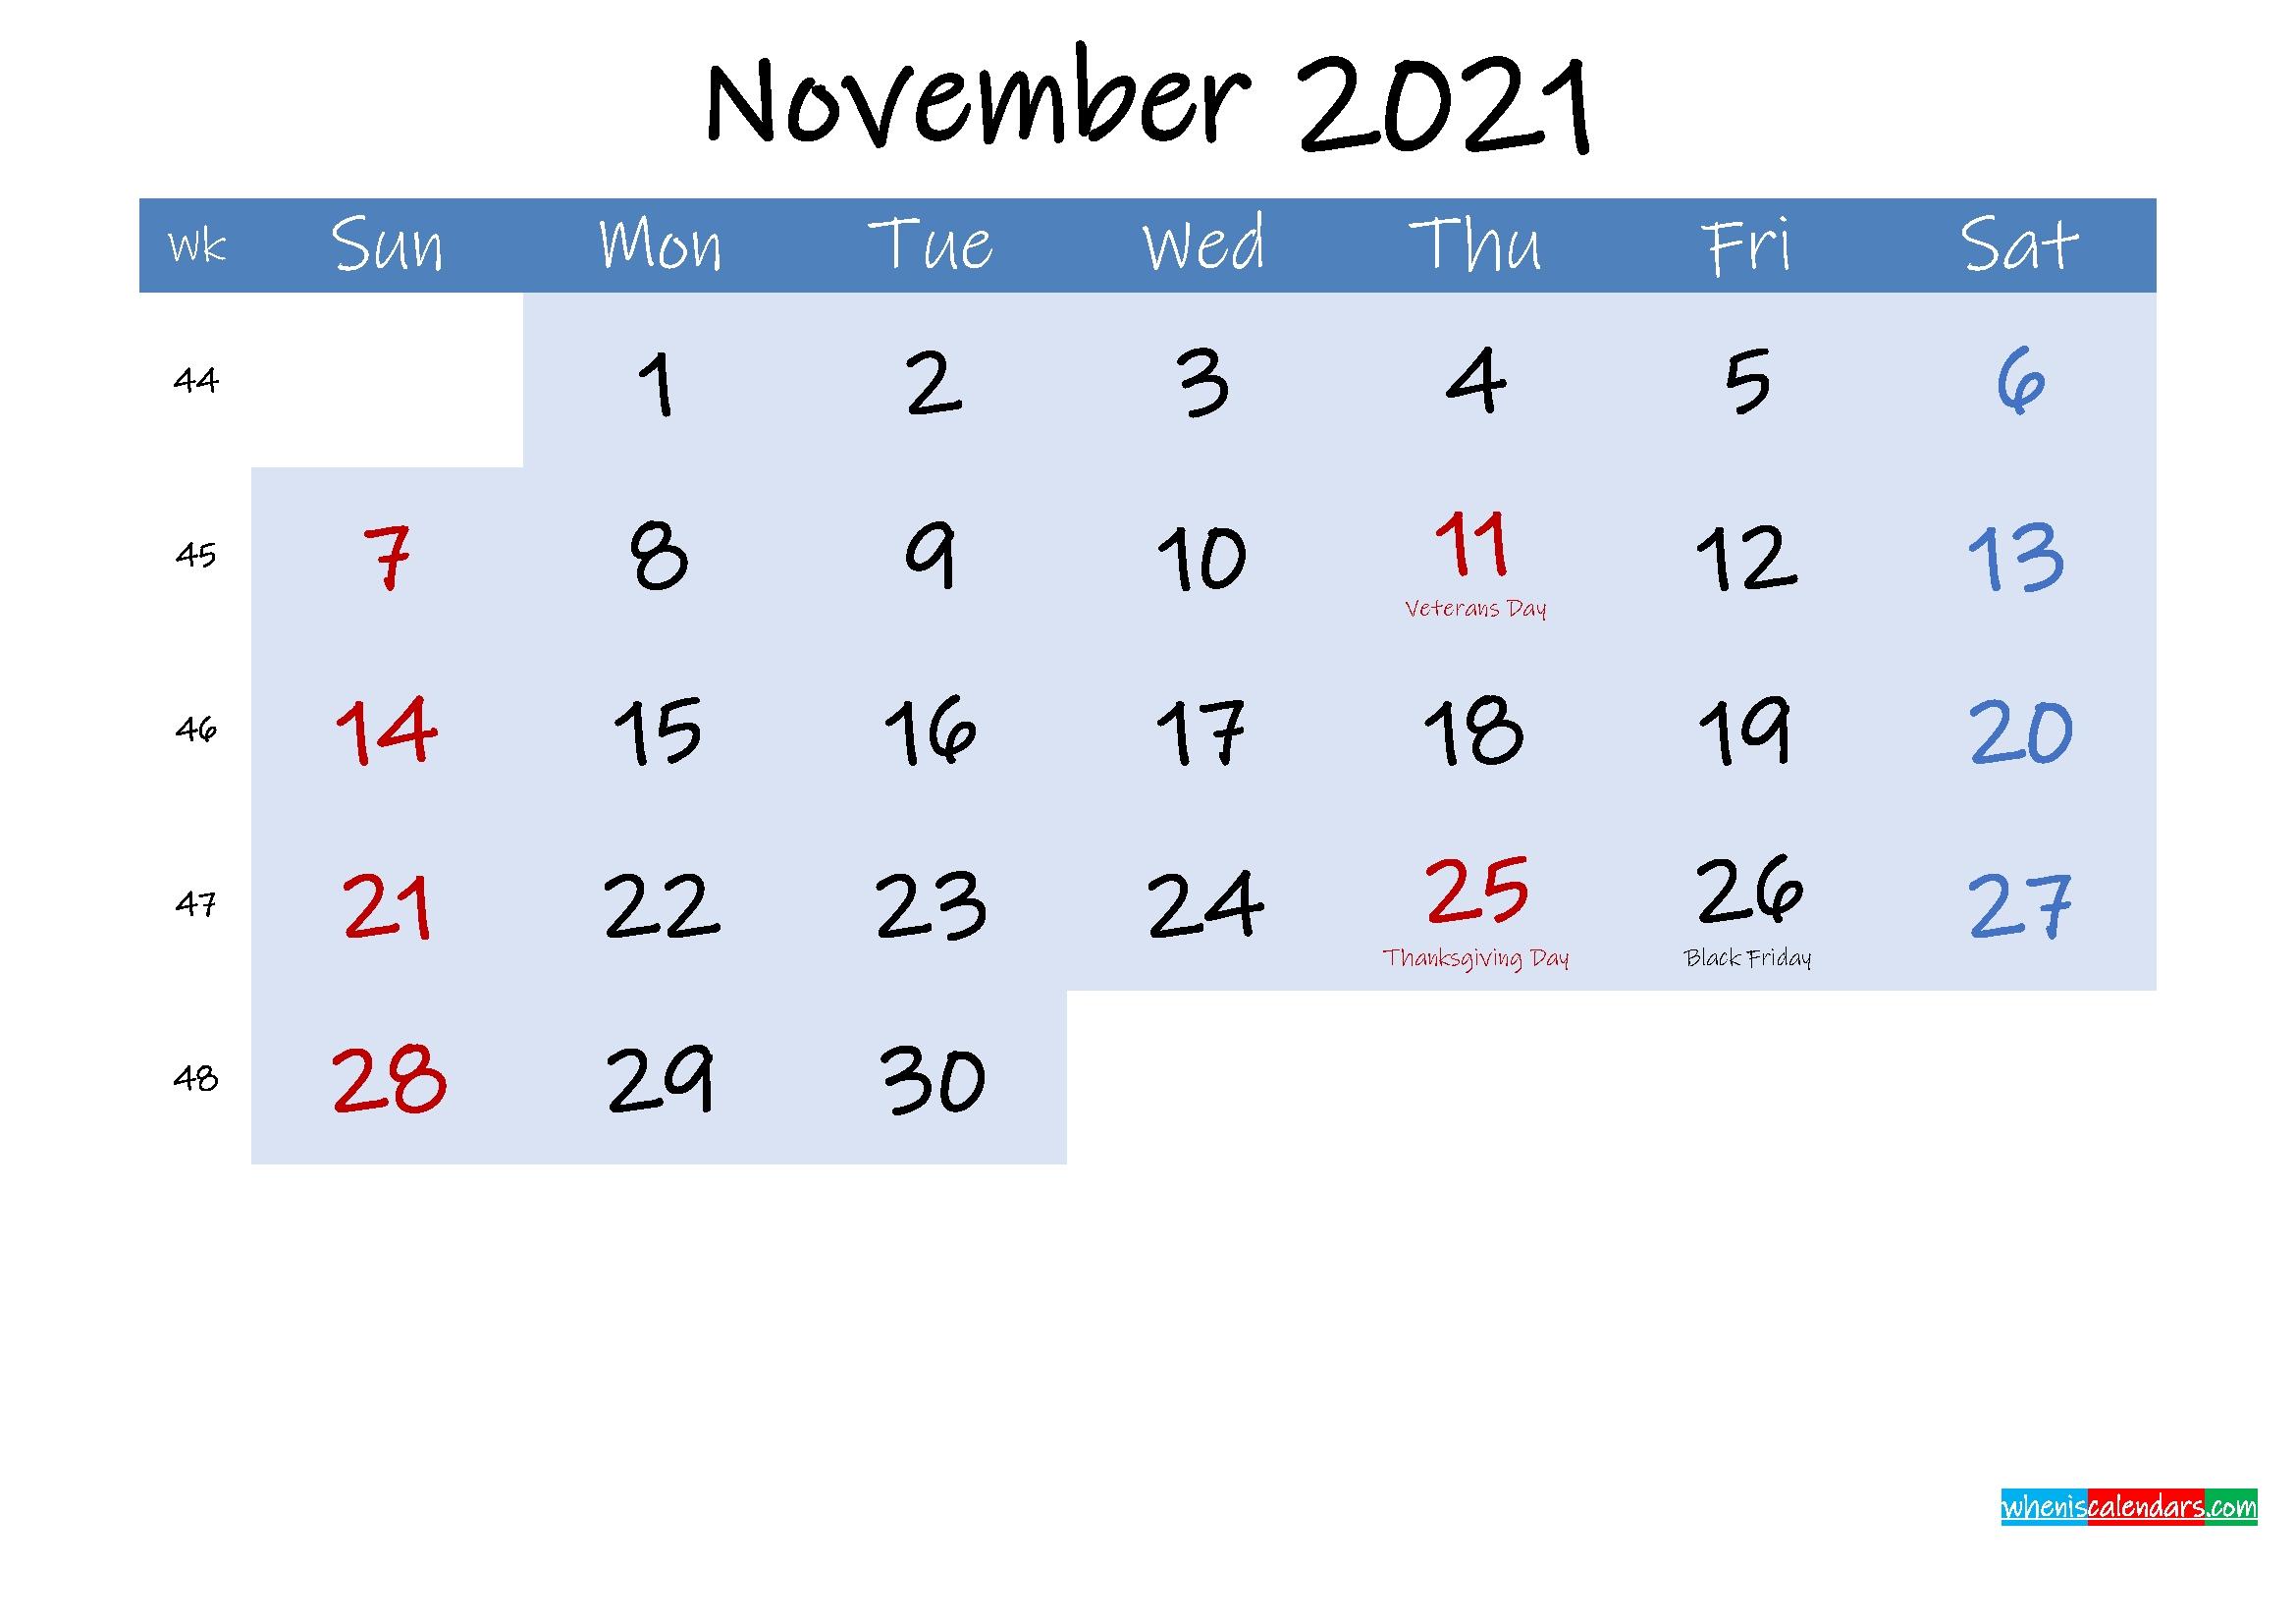 Free November 2021 Monthly Calendar Pdf - Template Ink21M191 - 2021 Calendar Printable Printable Calendar For November 2021